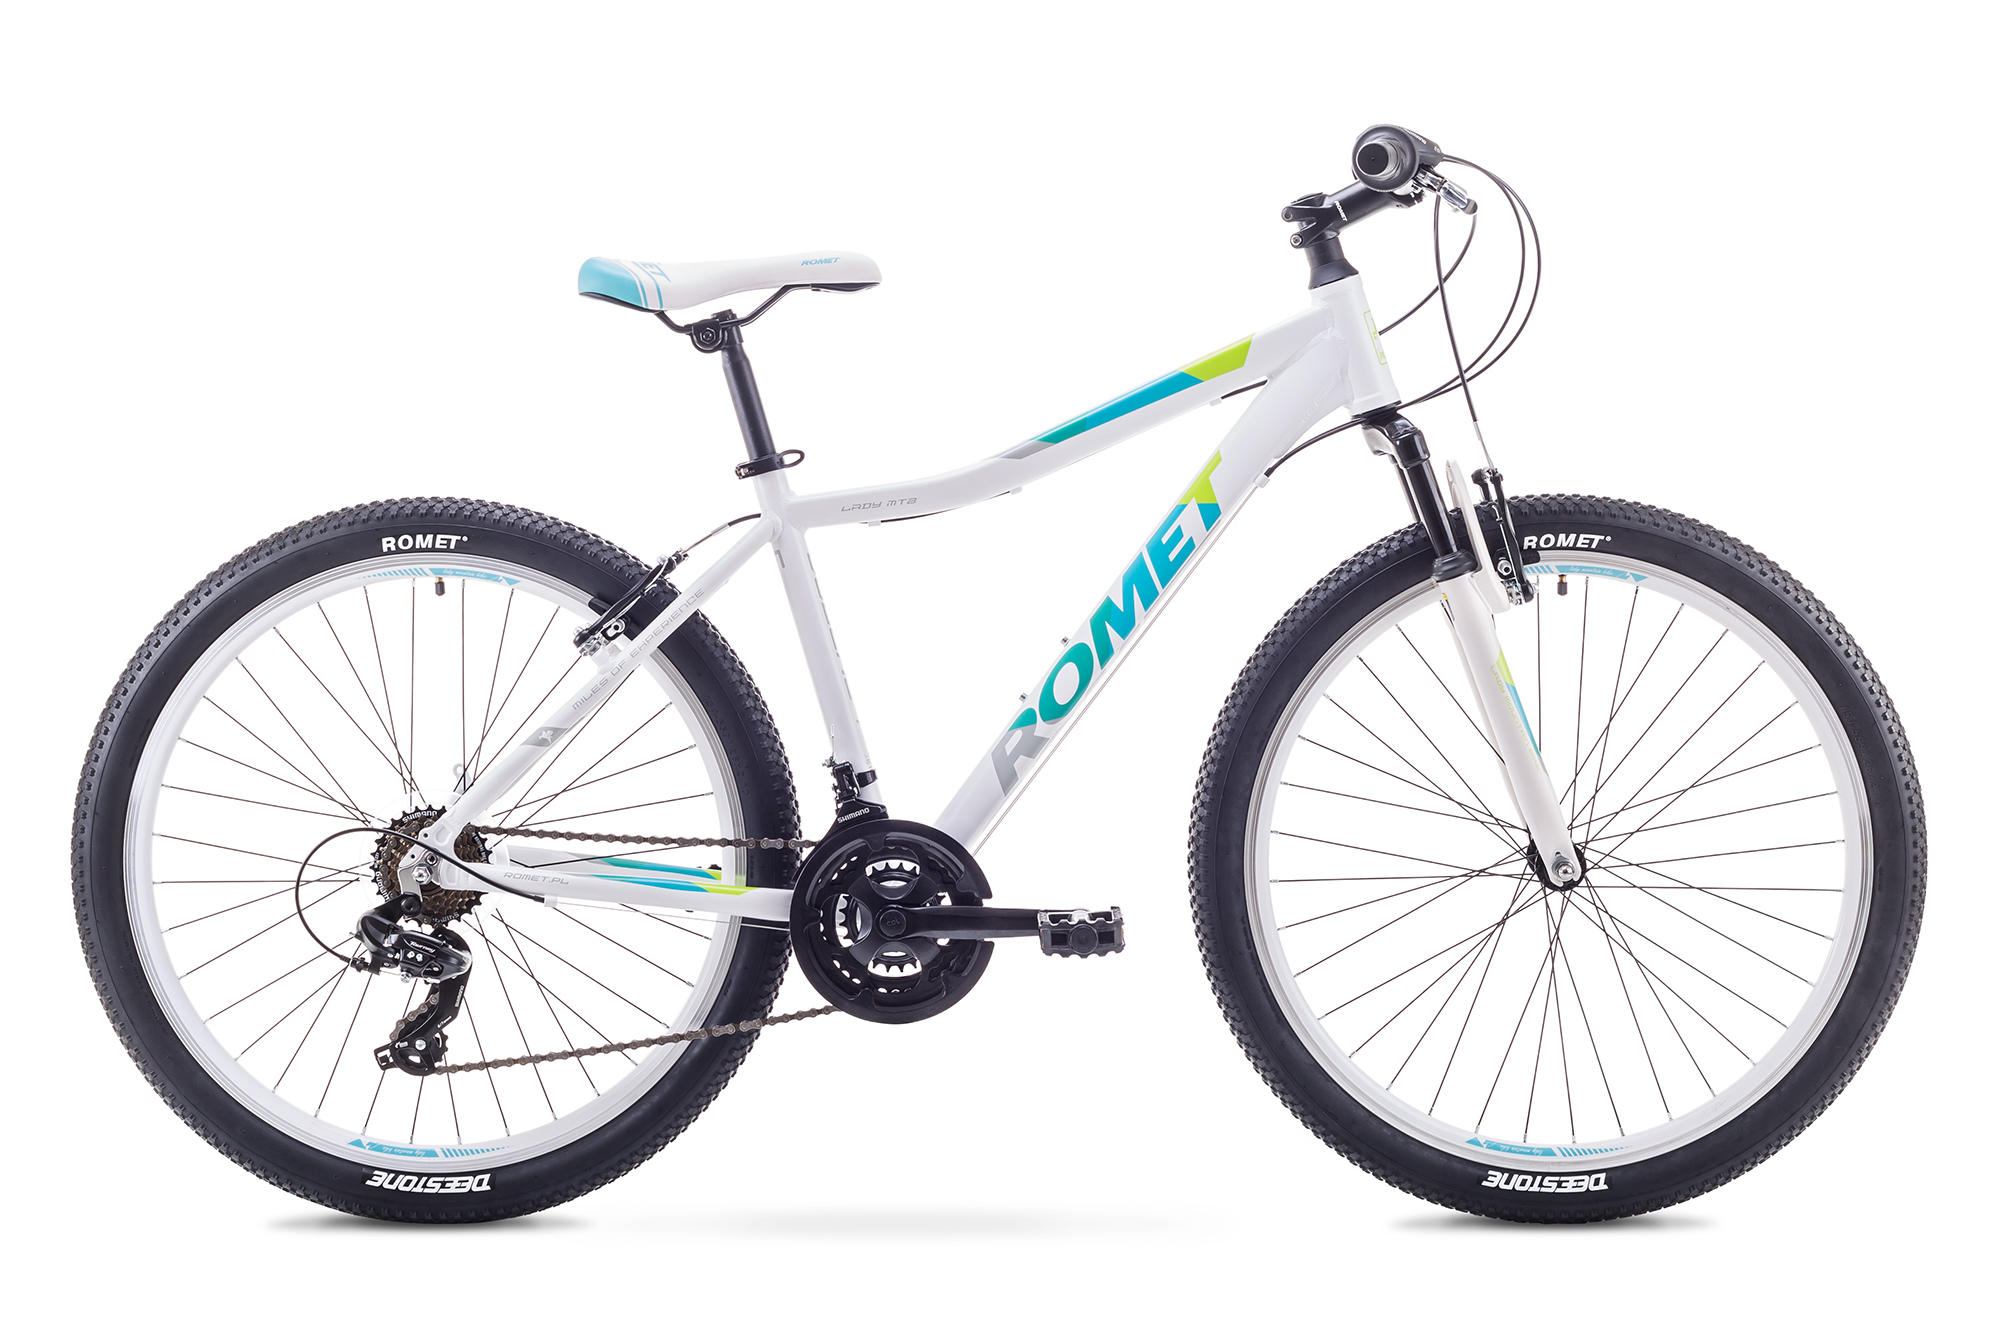 ROMET JOLENE 26 1 (AR) 1826705 19L BAL/ZILS VELOSIPĒDS kalnu velosipēds MTB